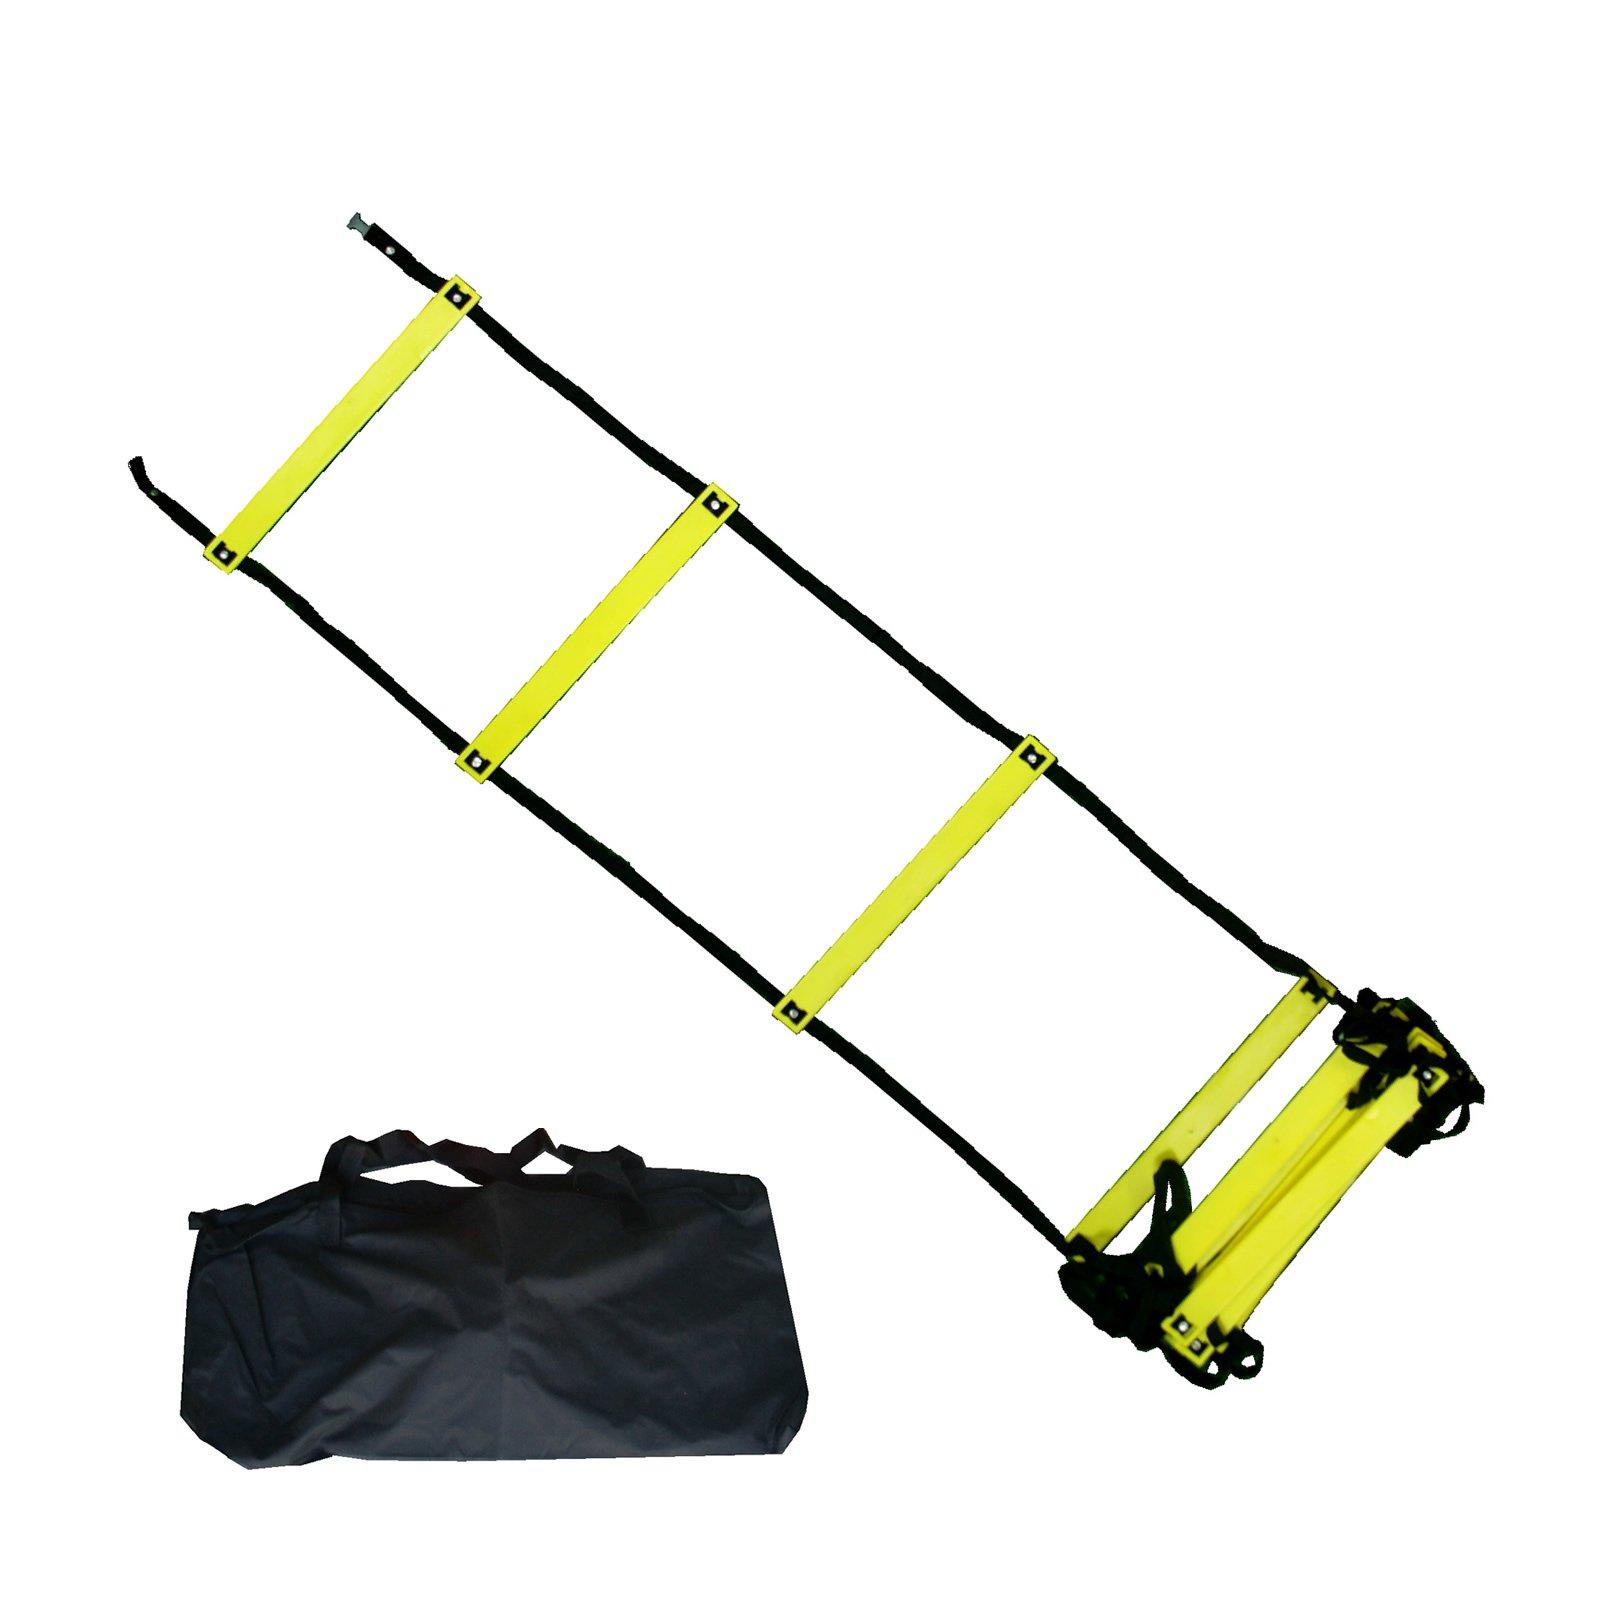 BlueDot Trading Speed Agility Training Sports Equipment Ladder, 15-Feet